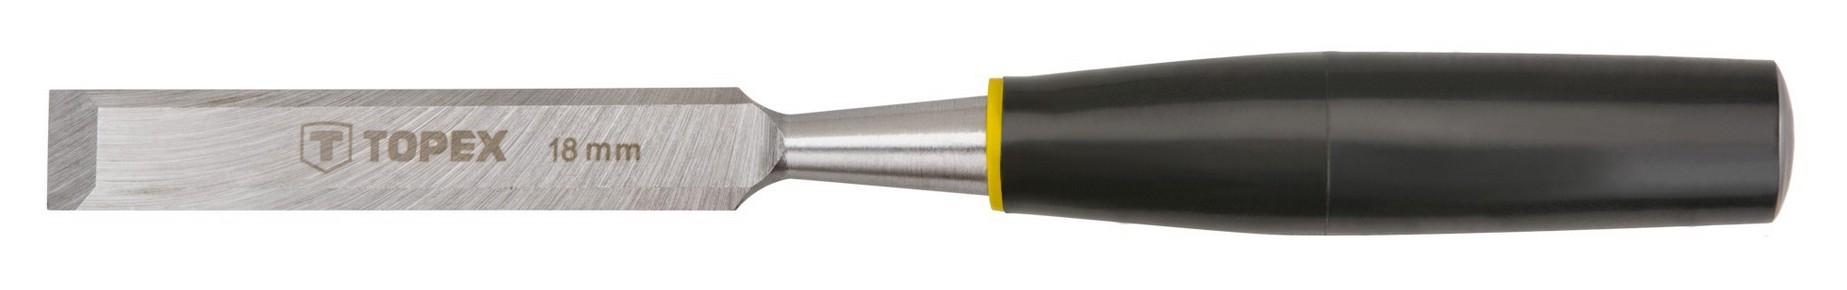 Favésõ 18 mm lapos, mûanyag nyelû | TOPEX 09A118